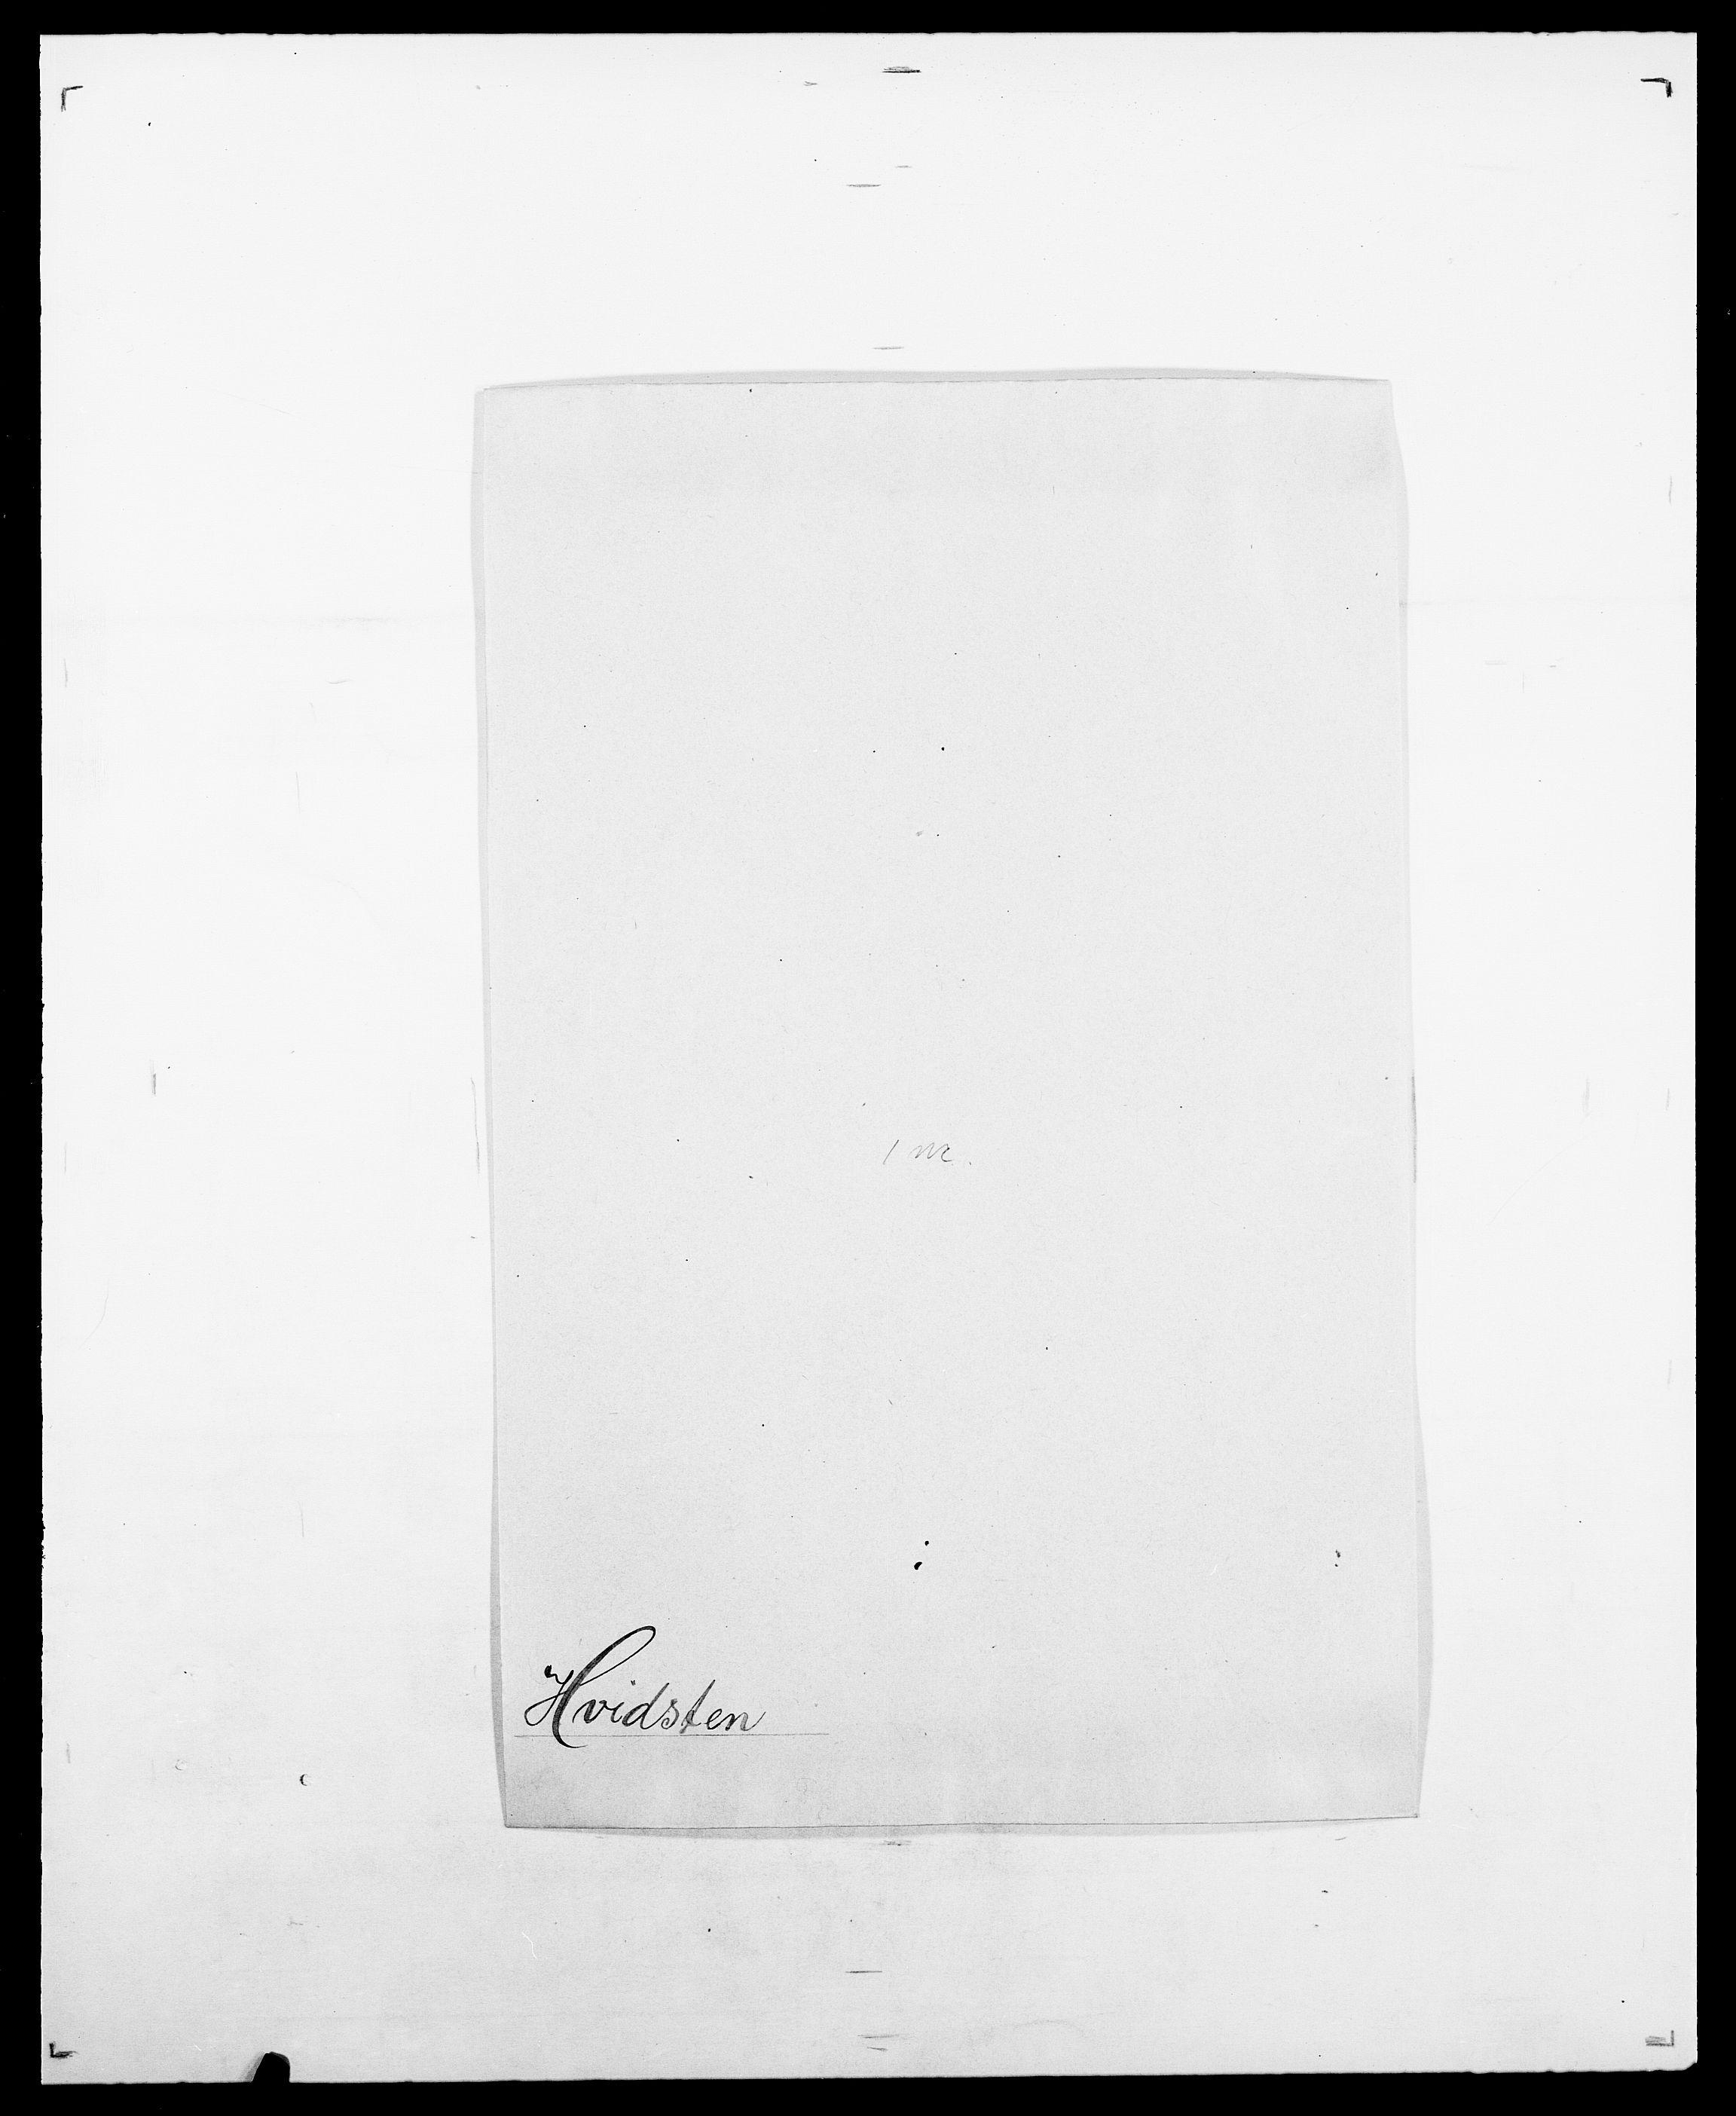 SAO, Delgobe, Charles Antoine - samling, D/Da/L0019: van der Hude - Joys, s. 191